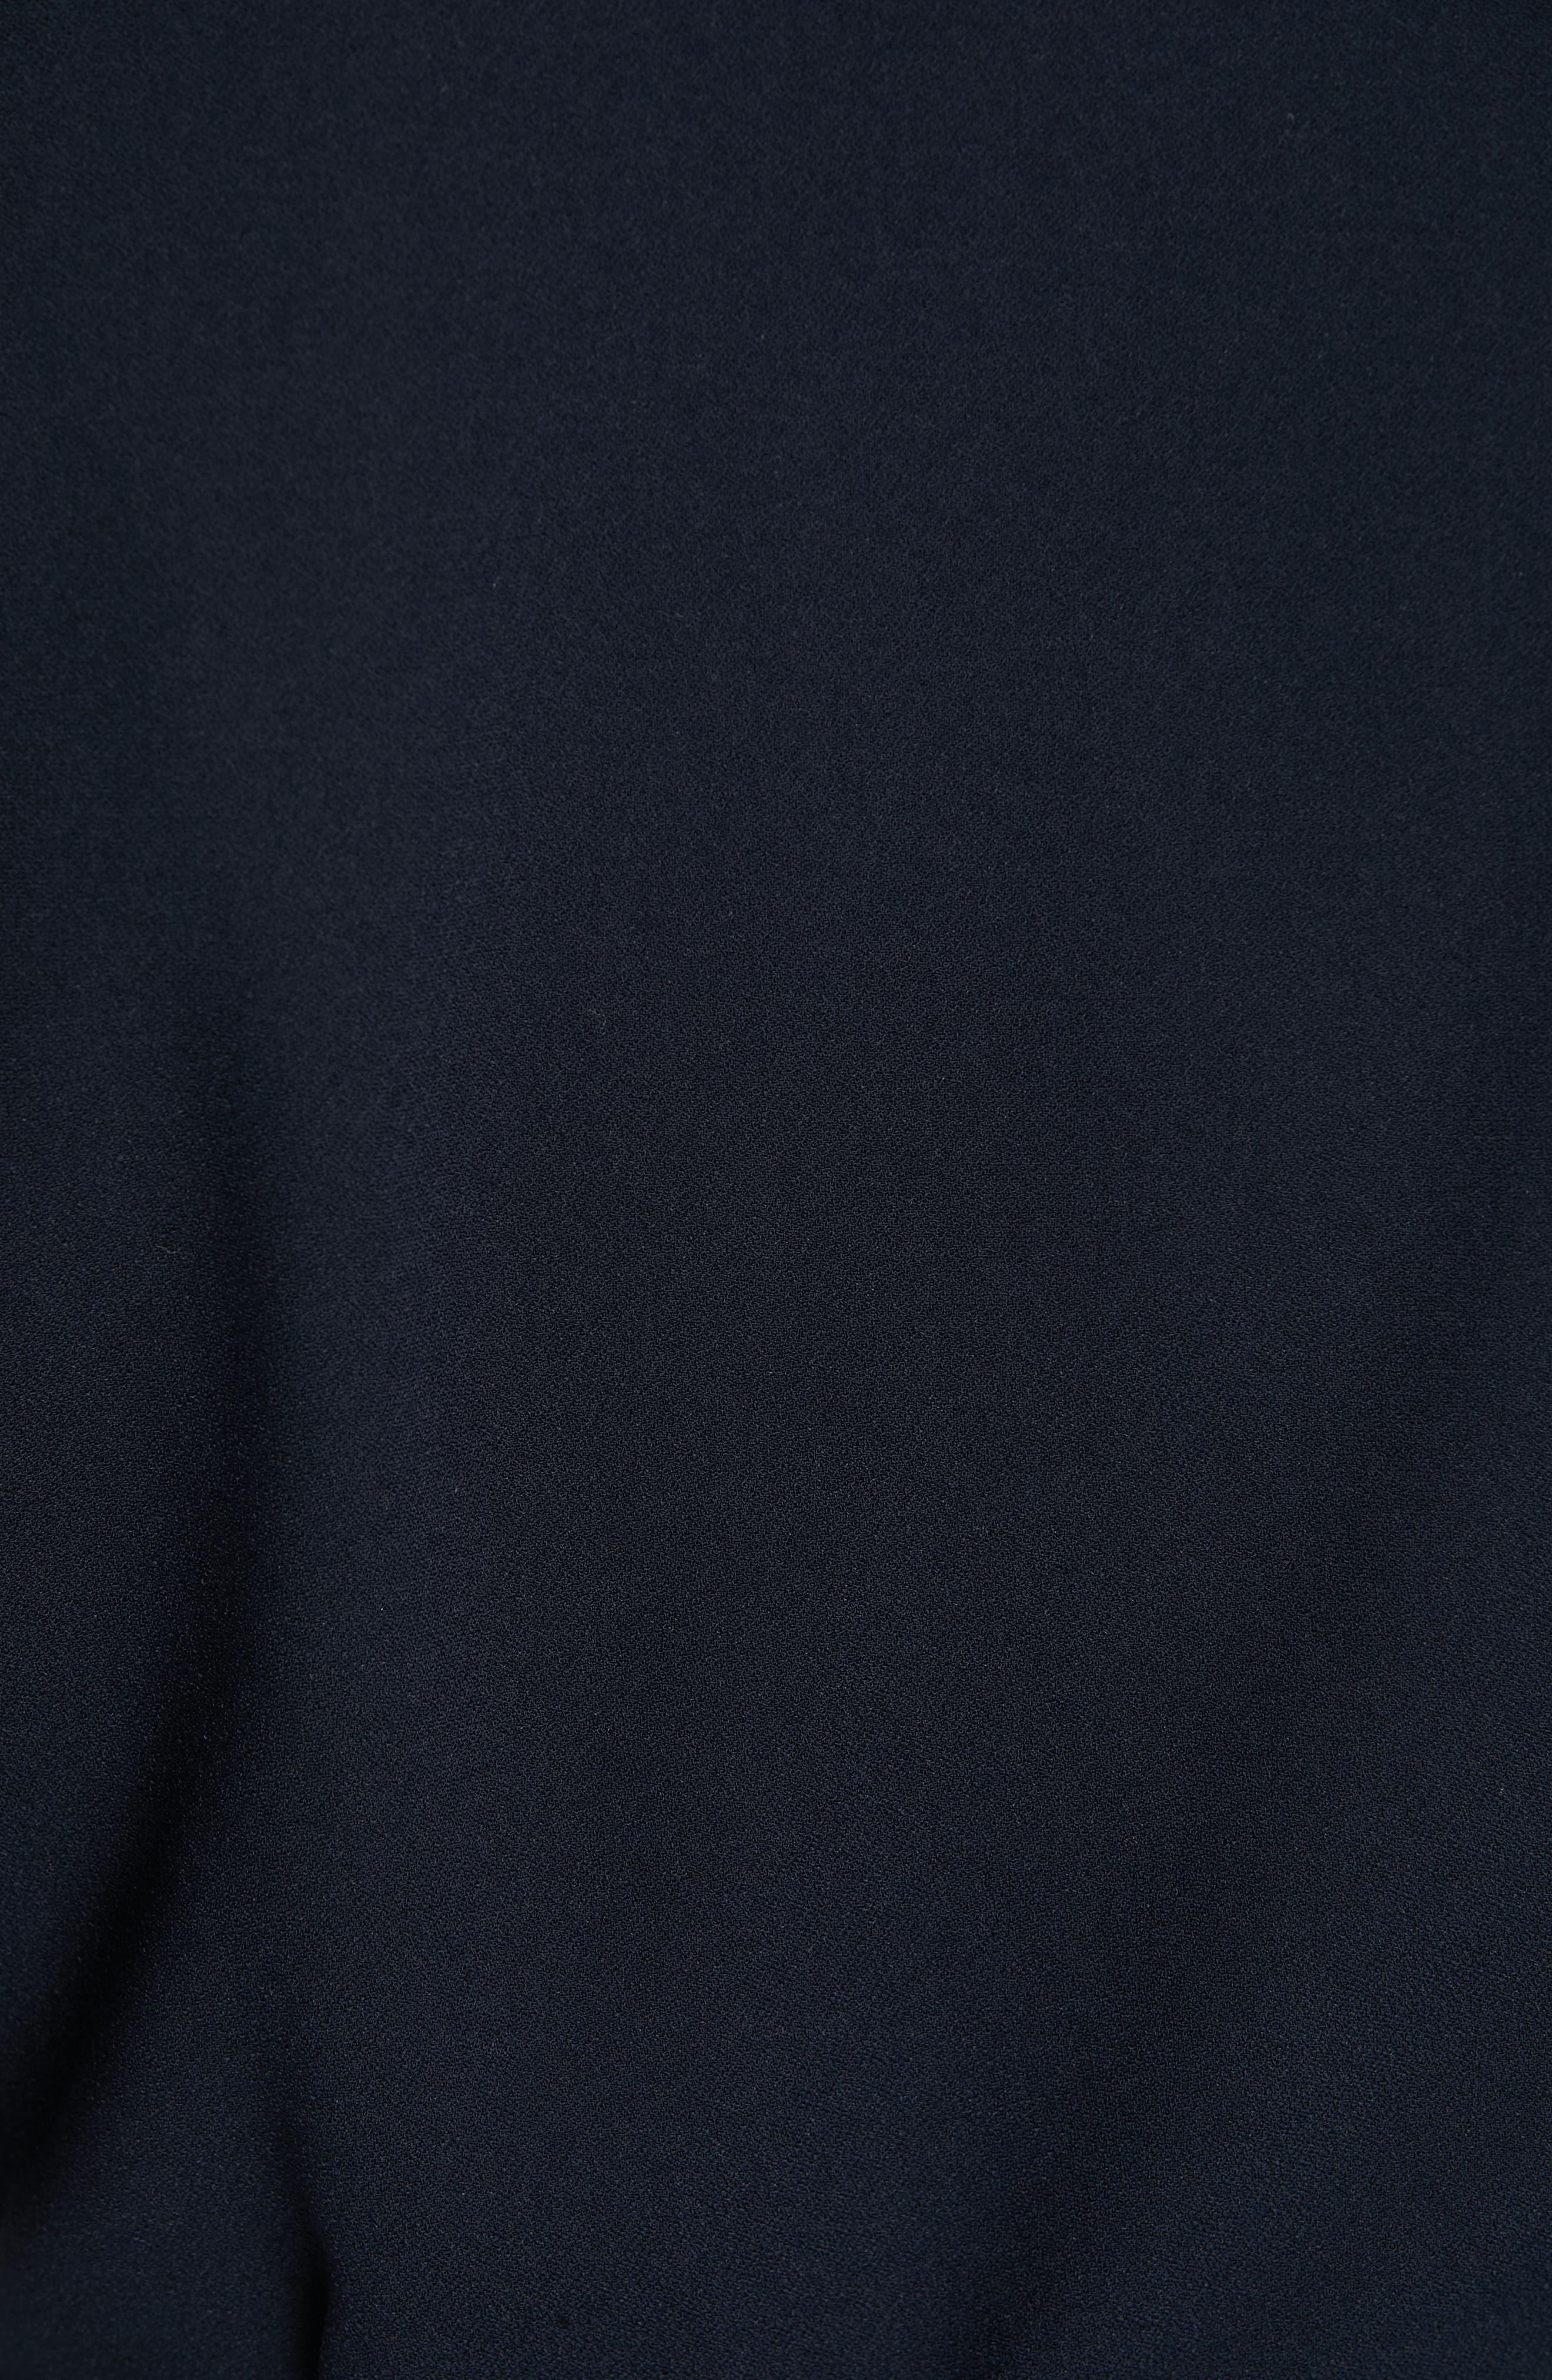 Aydrien Colorblock Dress,                             Alternate thumbnail 6, color,                             MID PORCELAIN-PINK SKY